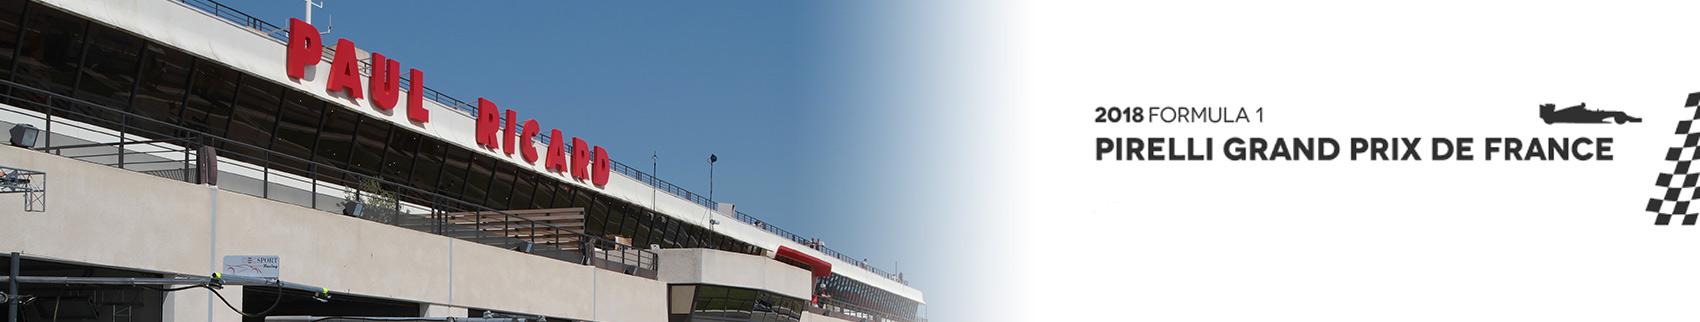 Paul Ricard circuit